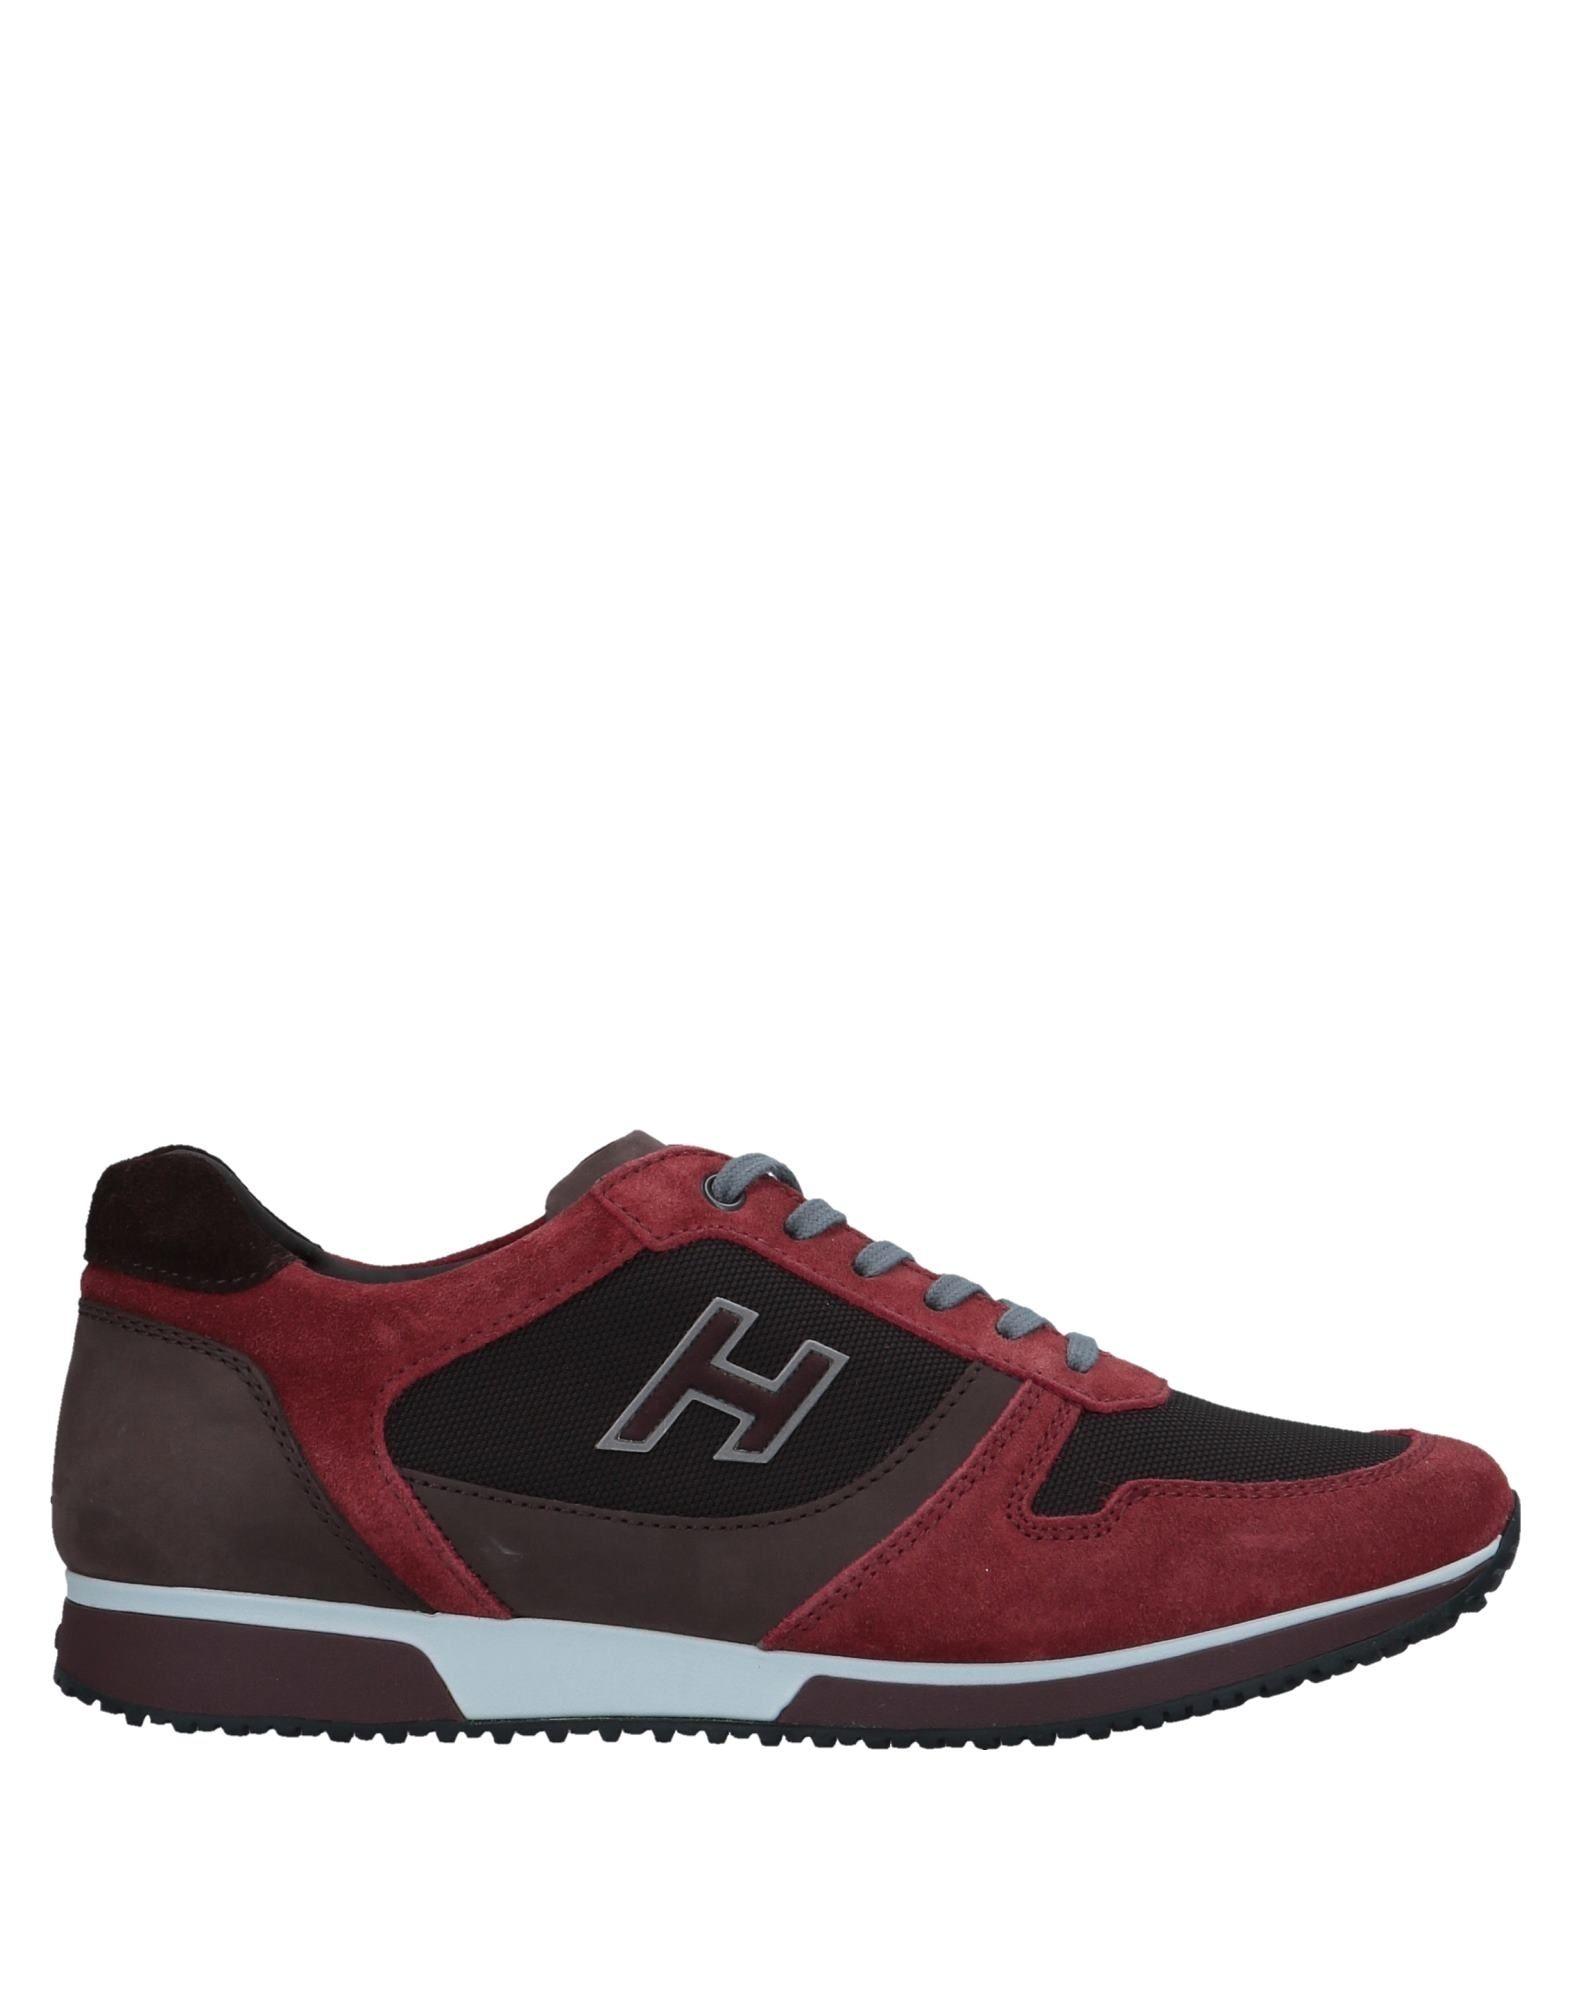 Hogan Sneakers Herren  11540591PF Gute Qualität beliebte Schuhe